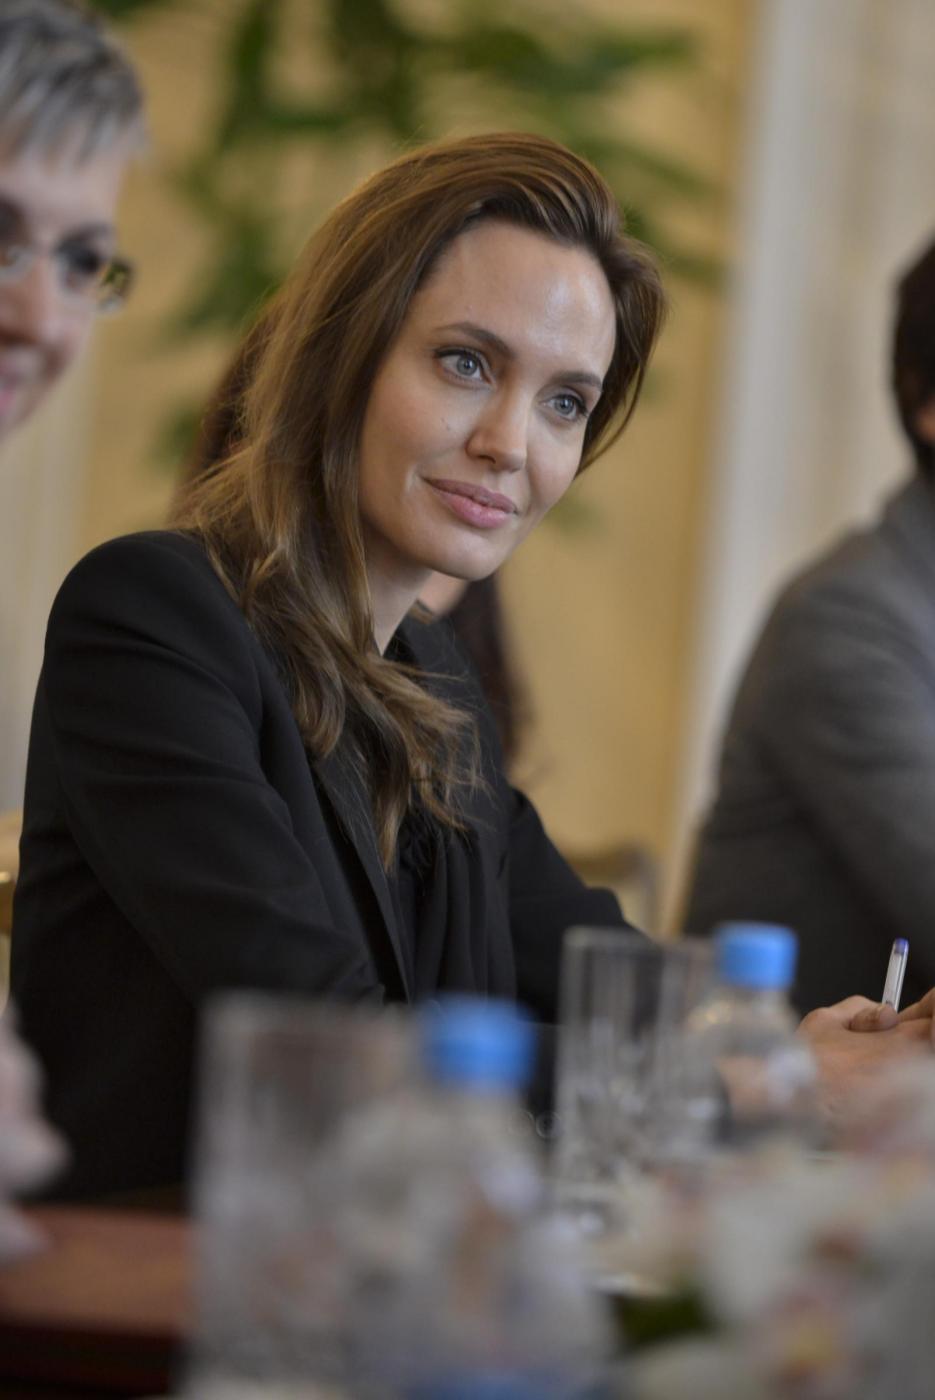 Angelina Jolie in Bosnia contro stupri in guerra06